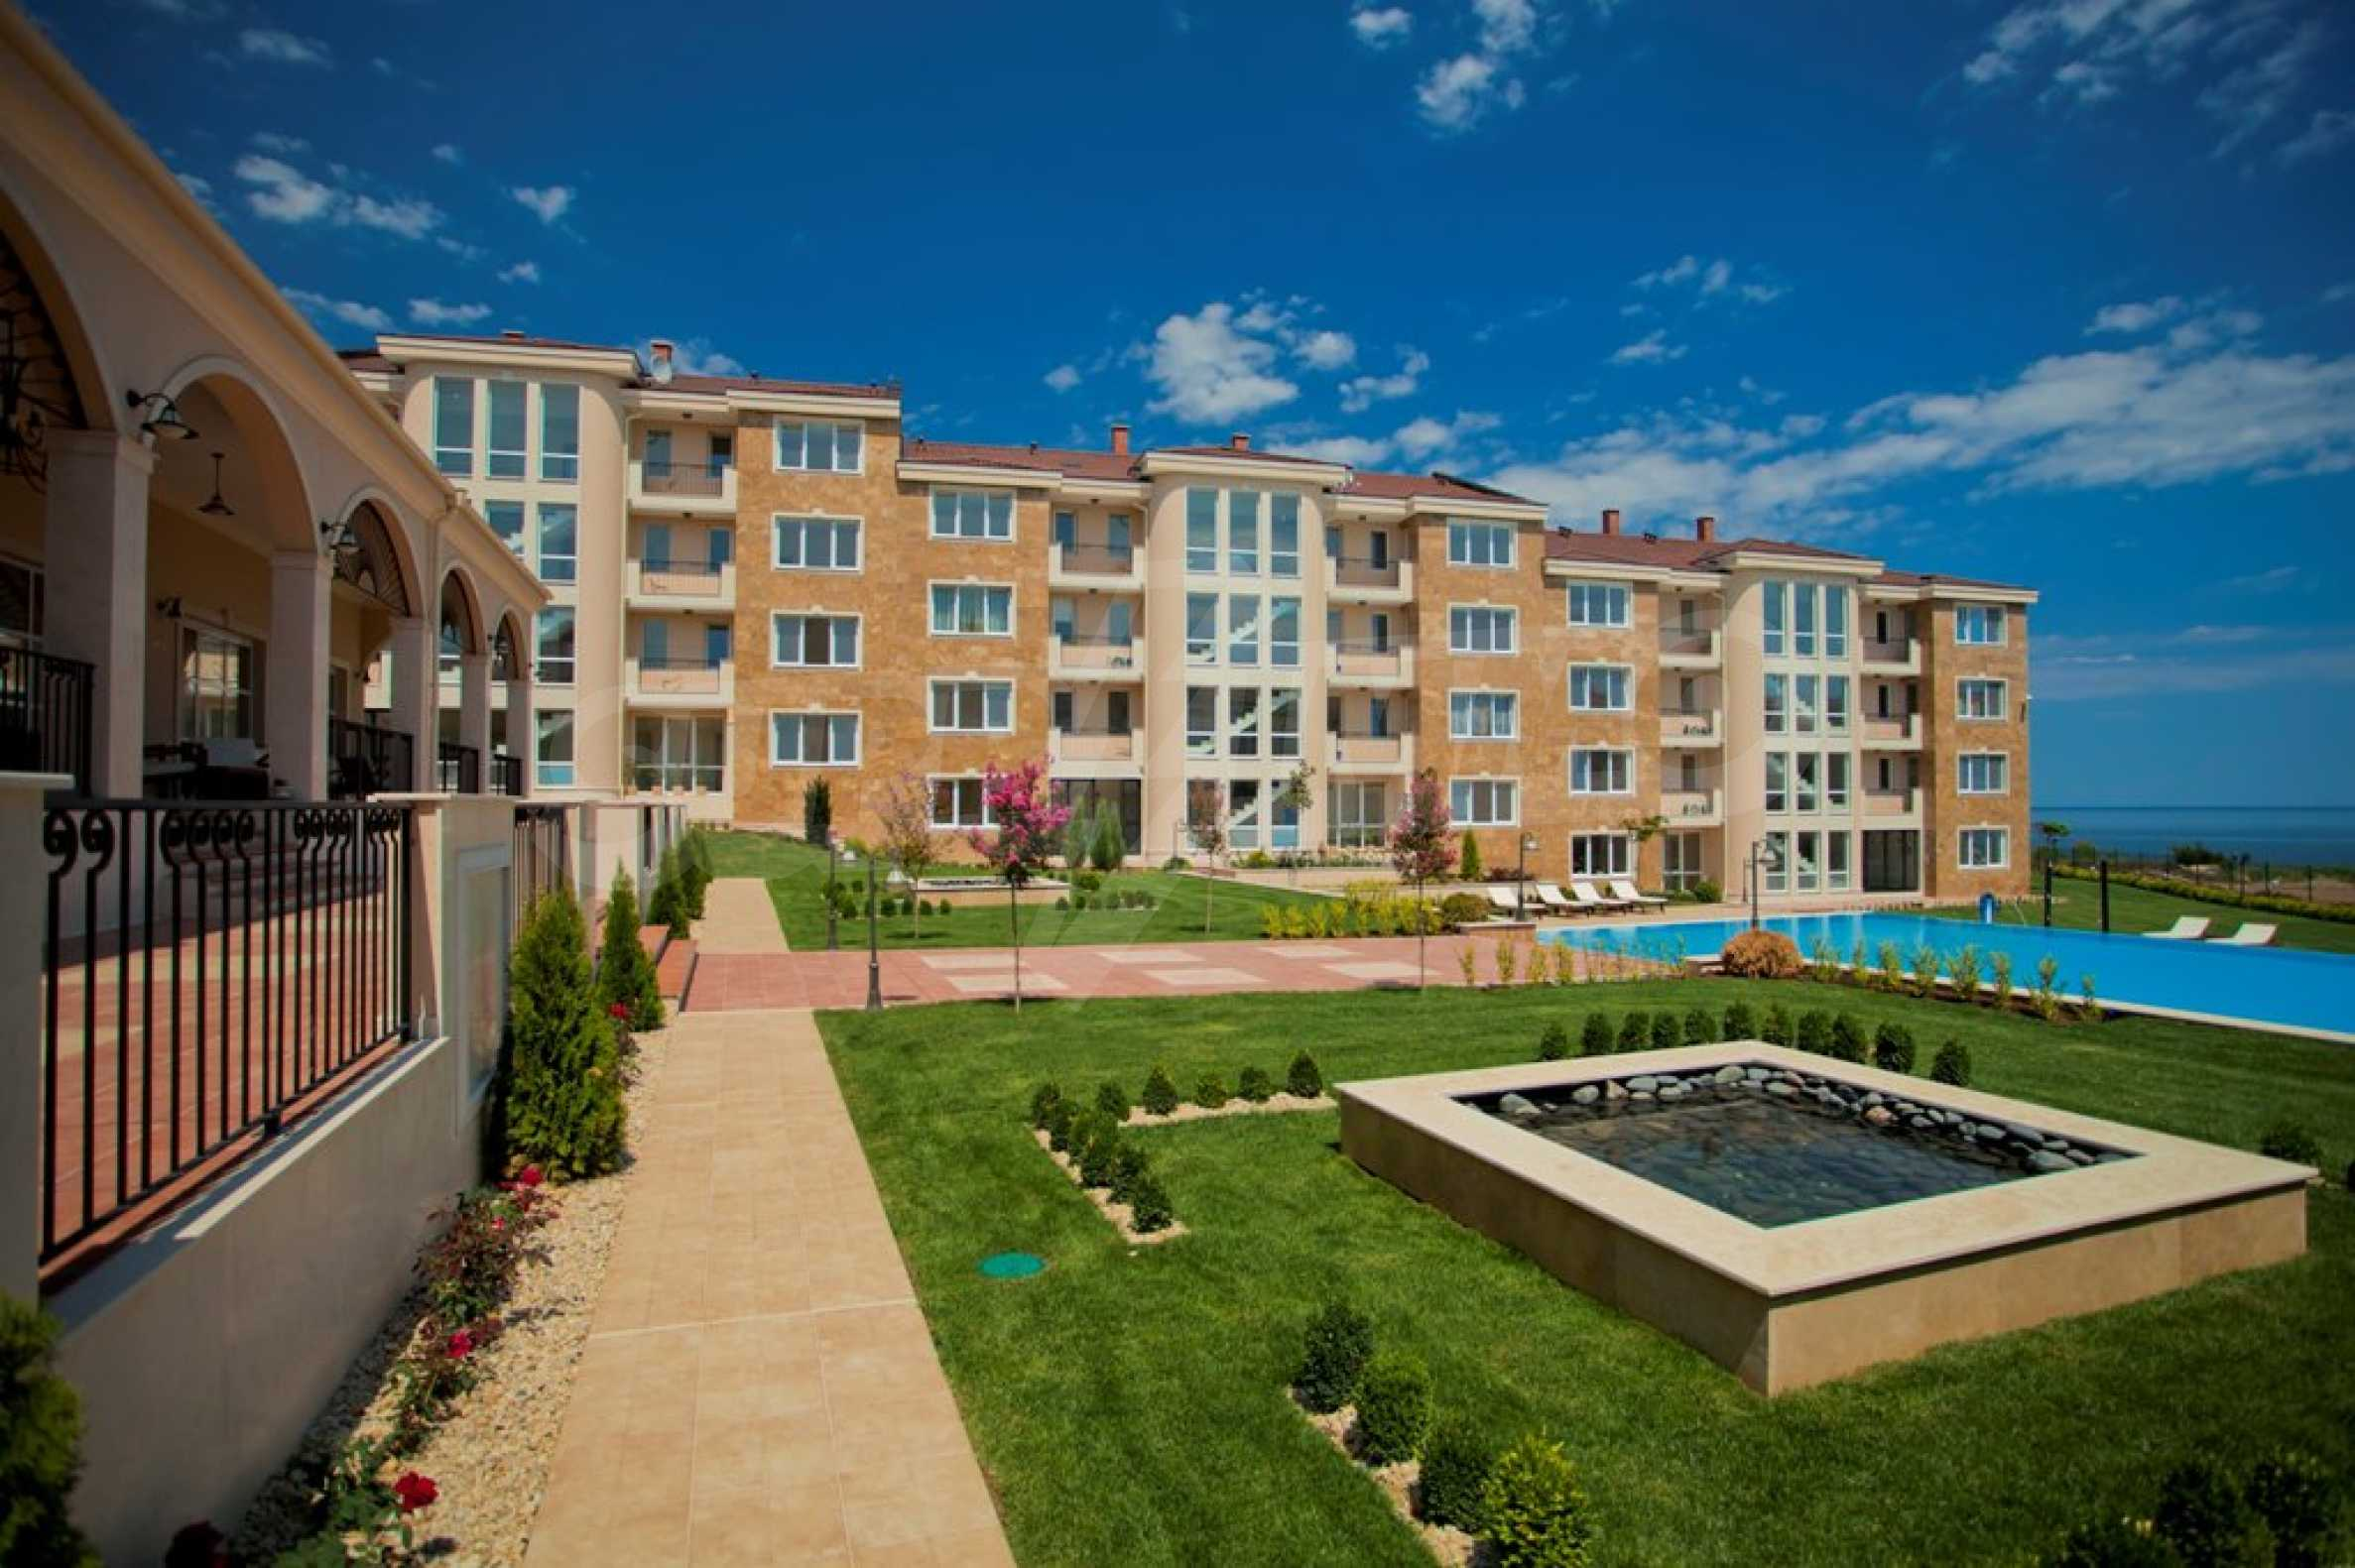 New apartment complex Atia resort in Chernomorets 12